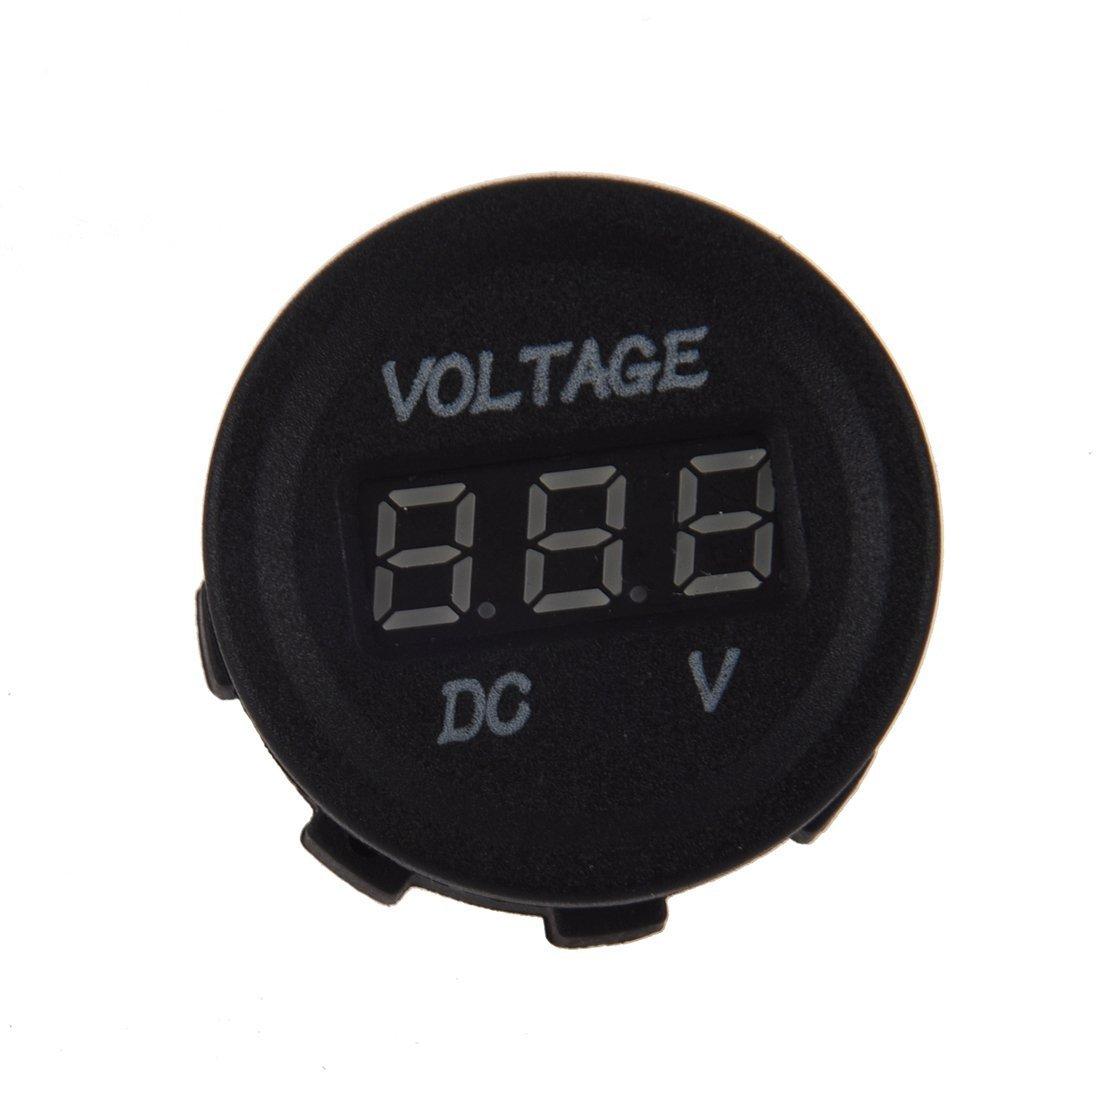 Voltage Meter - TOOGOO(R) DC 12V-24V Motorcycle LED Digital Display Voltmeter Voltage Meter Round Panel(Red LED Display)